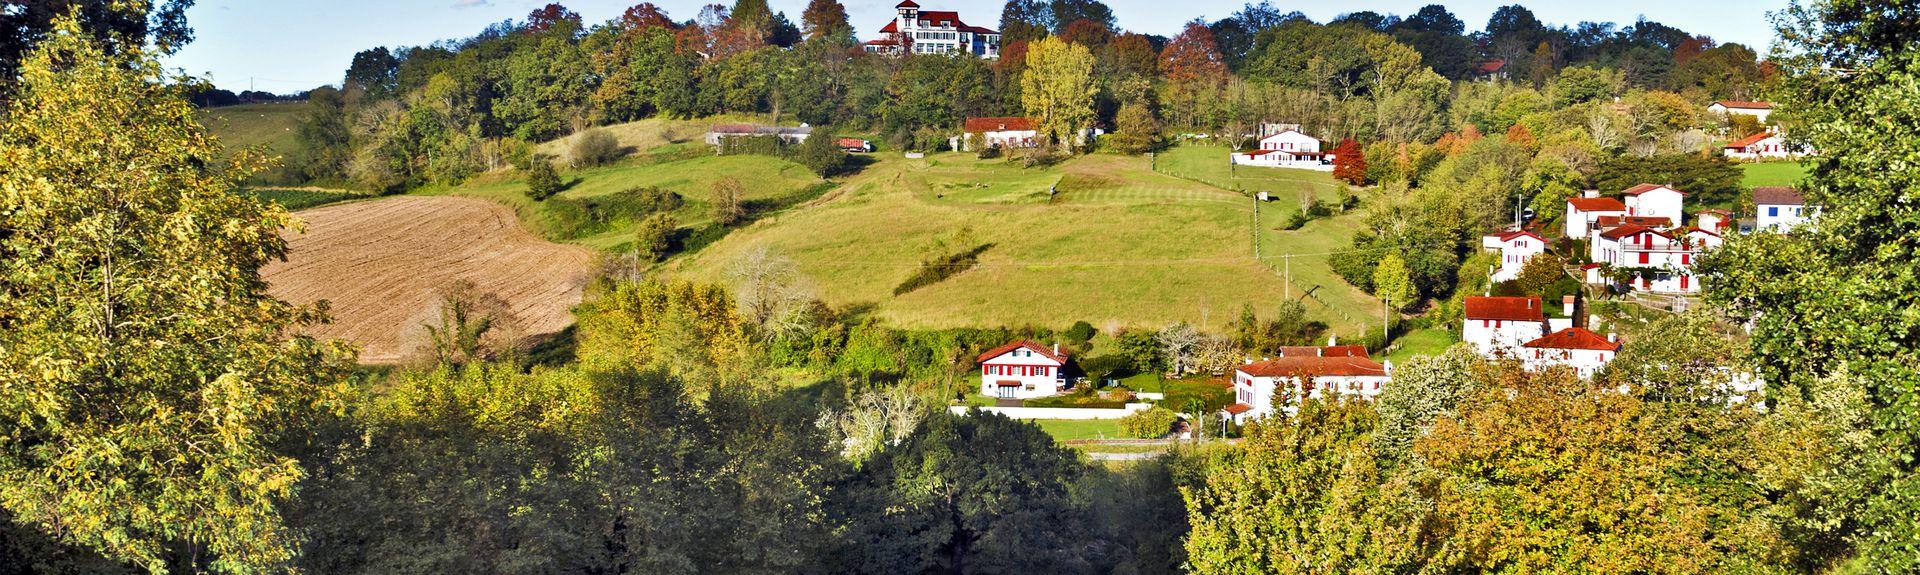 Cambo-les-Bains, Pyrenees-Atlantiques, France